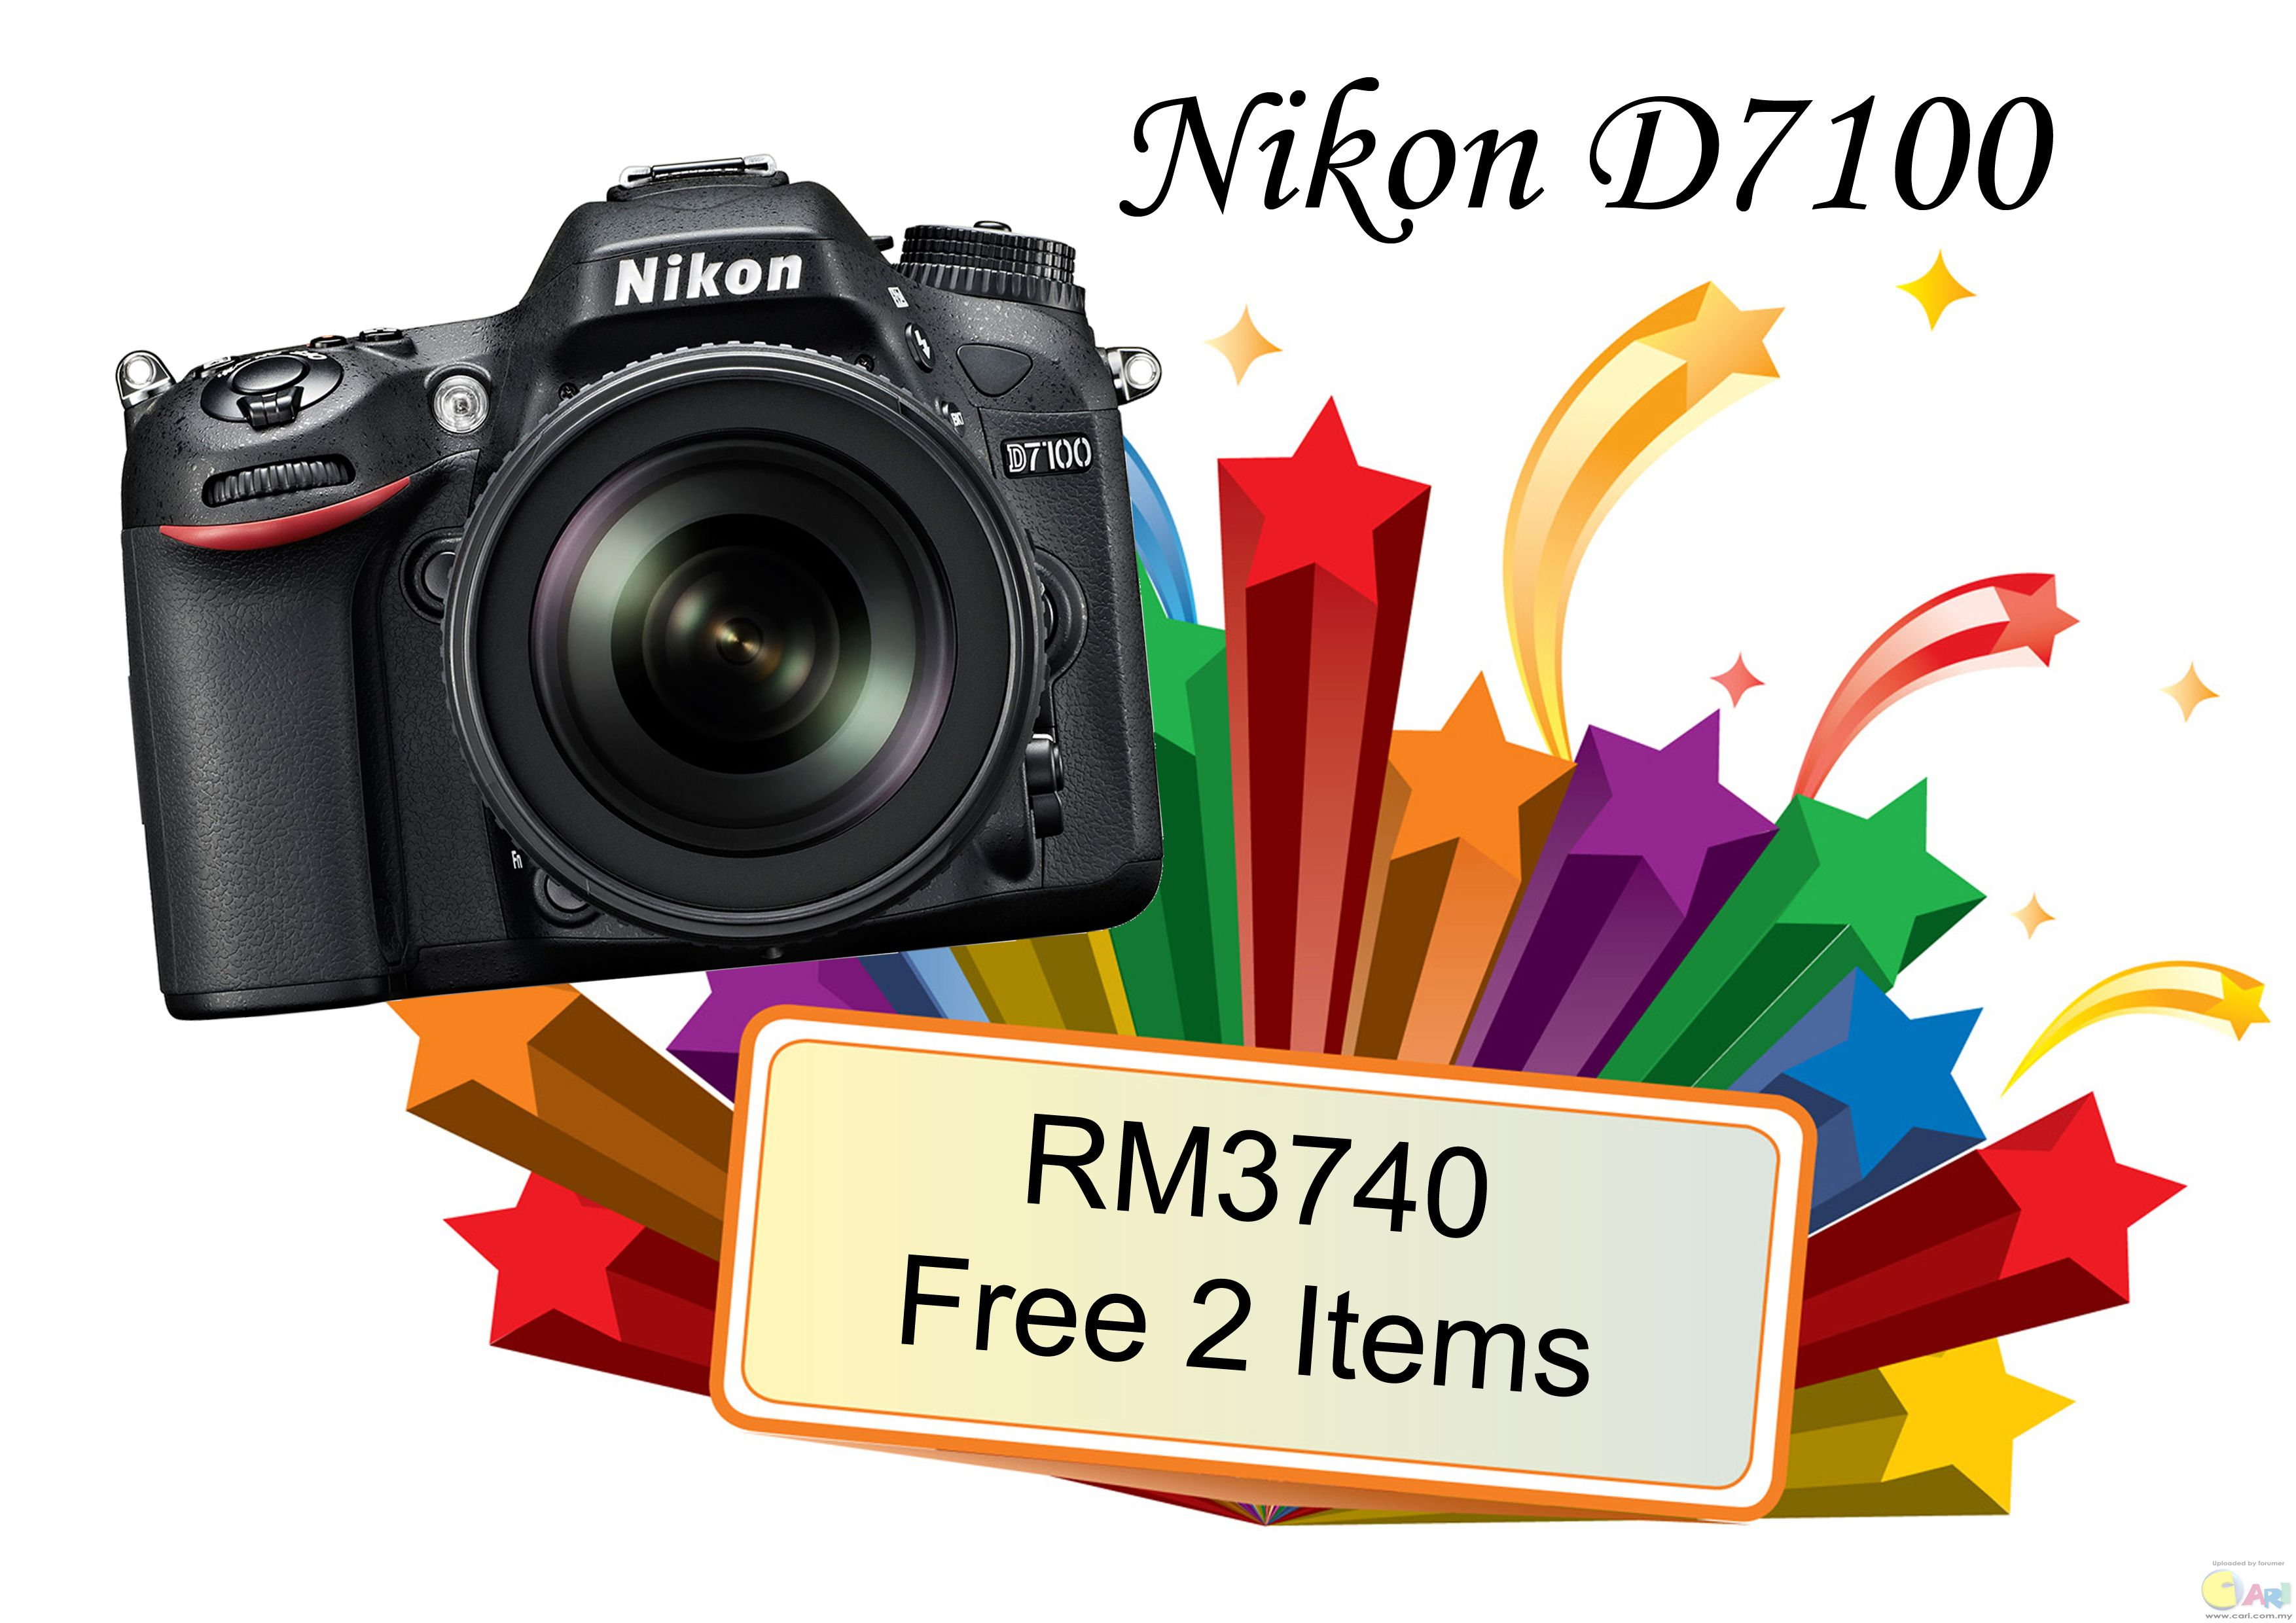 Nikon D7100.JPG